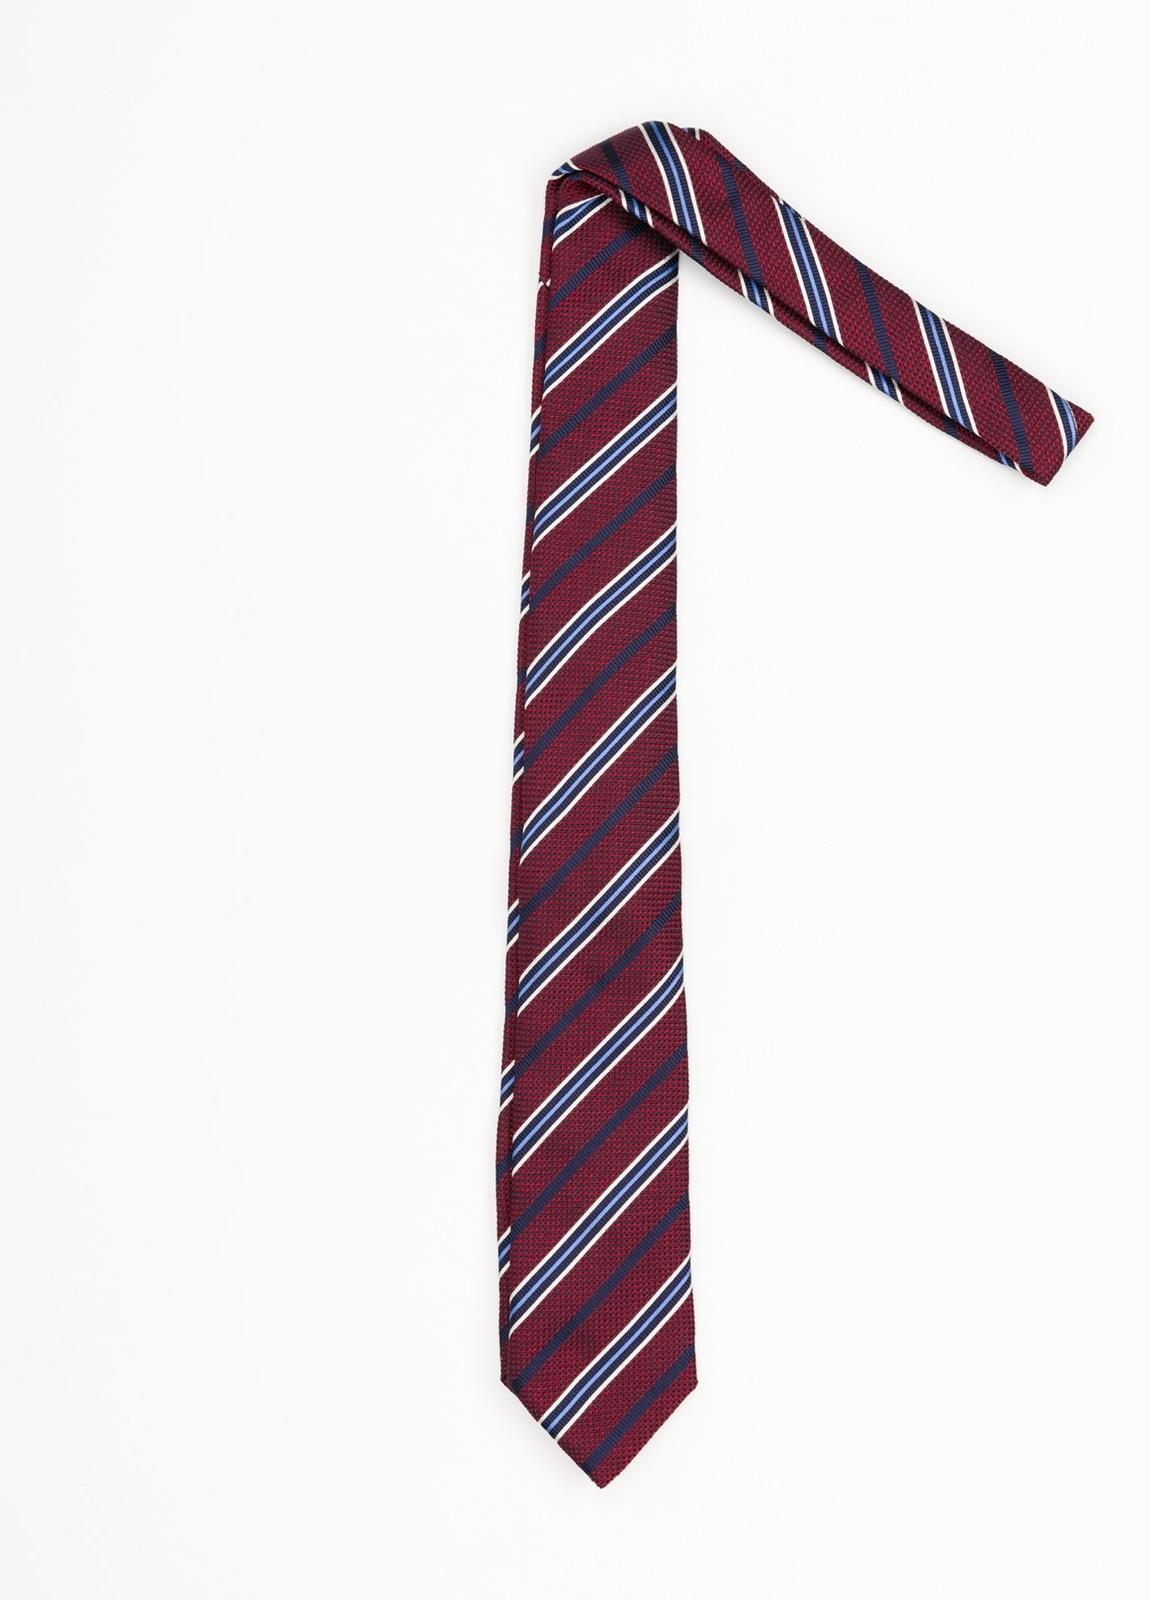 Corbata Formal Wear rayas diagonales, color granate. Pala 7,5 cm. 100% Seda. - Ítem1